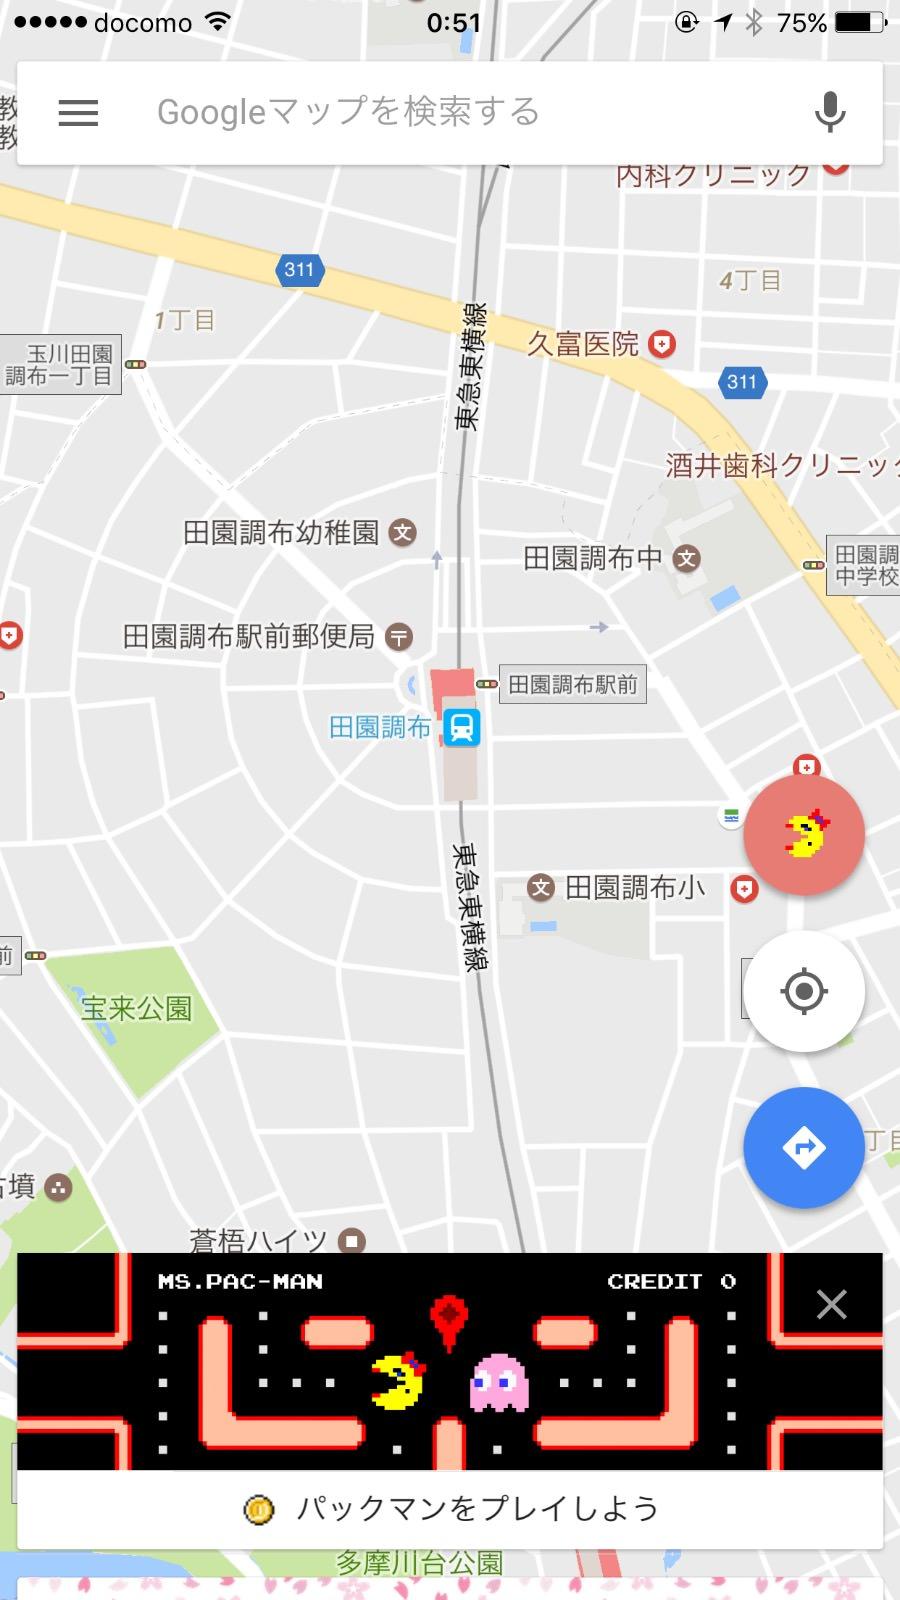 Pacman googlemap 8738